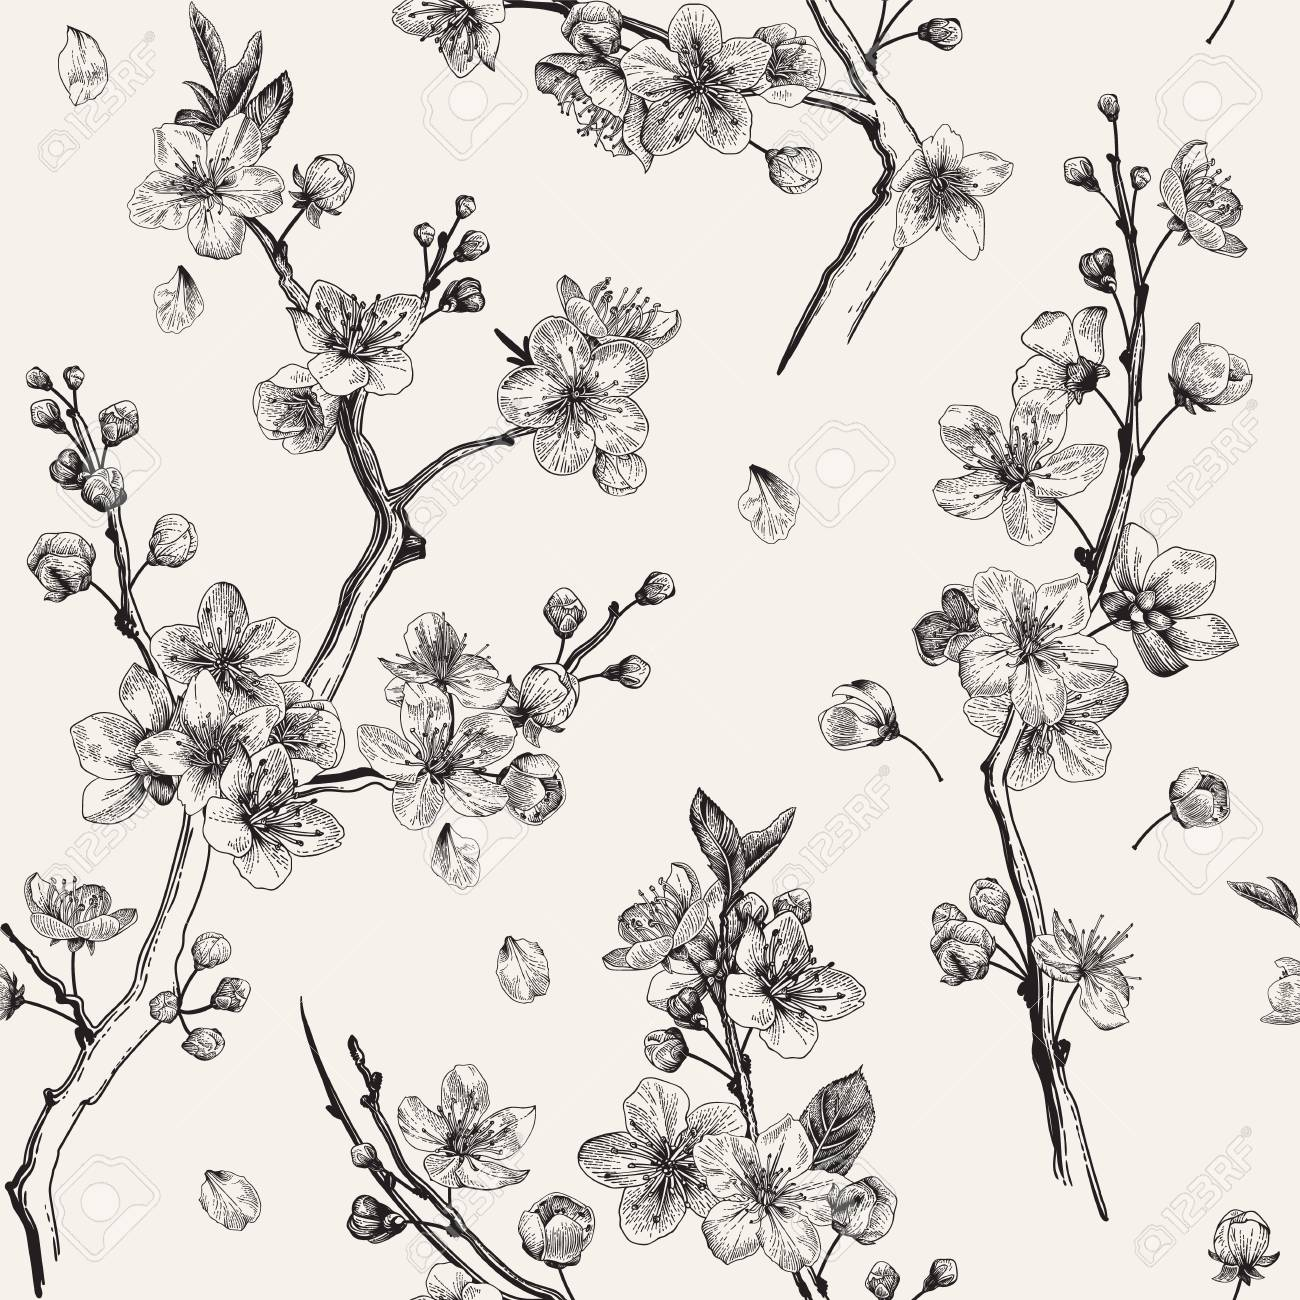 Sakura. Seamless pattern. Cherry blossom branches. Vector botanical illustration. Black and white - 93216382